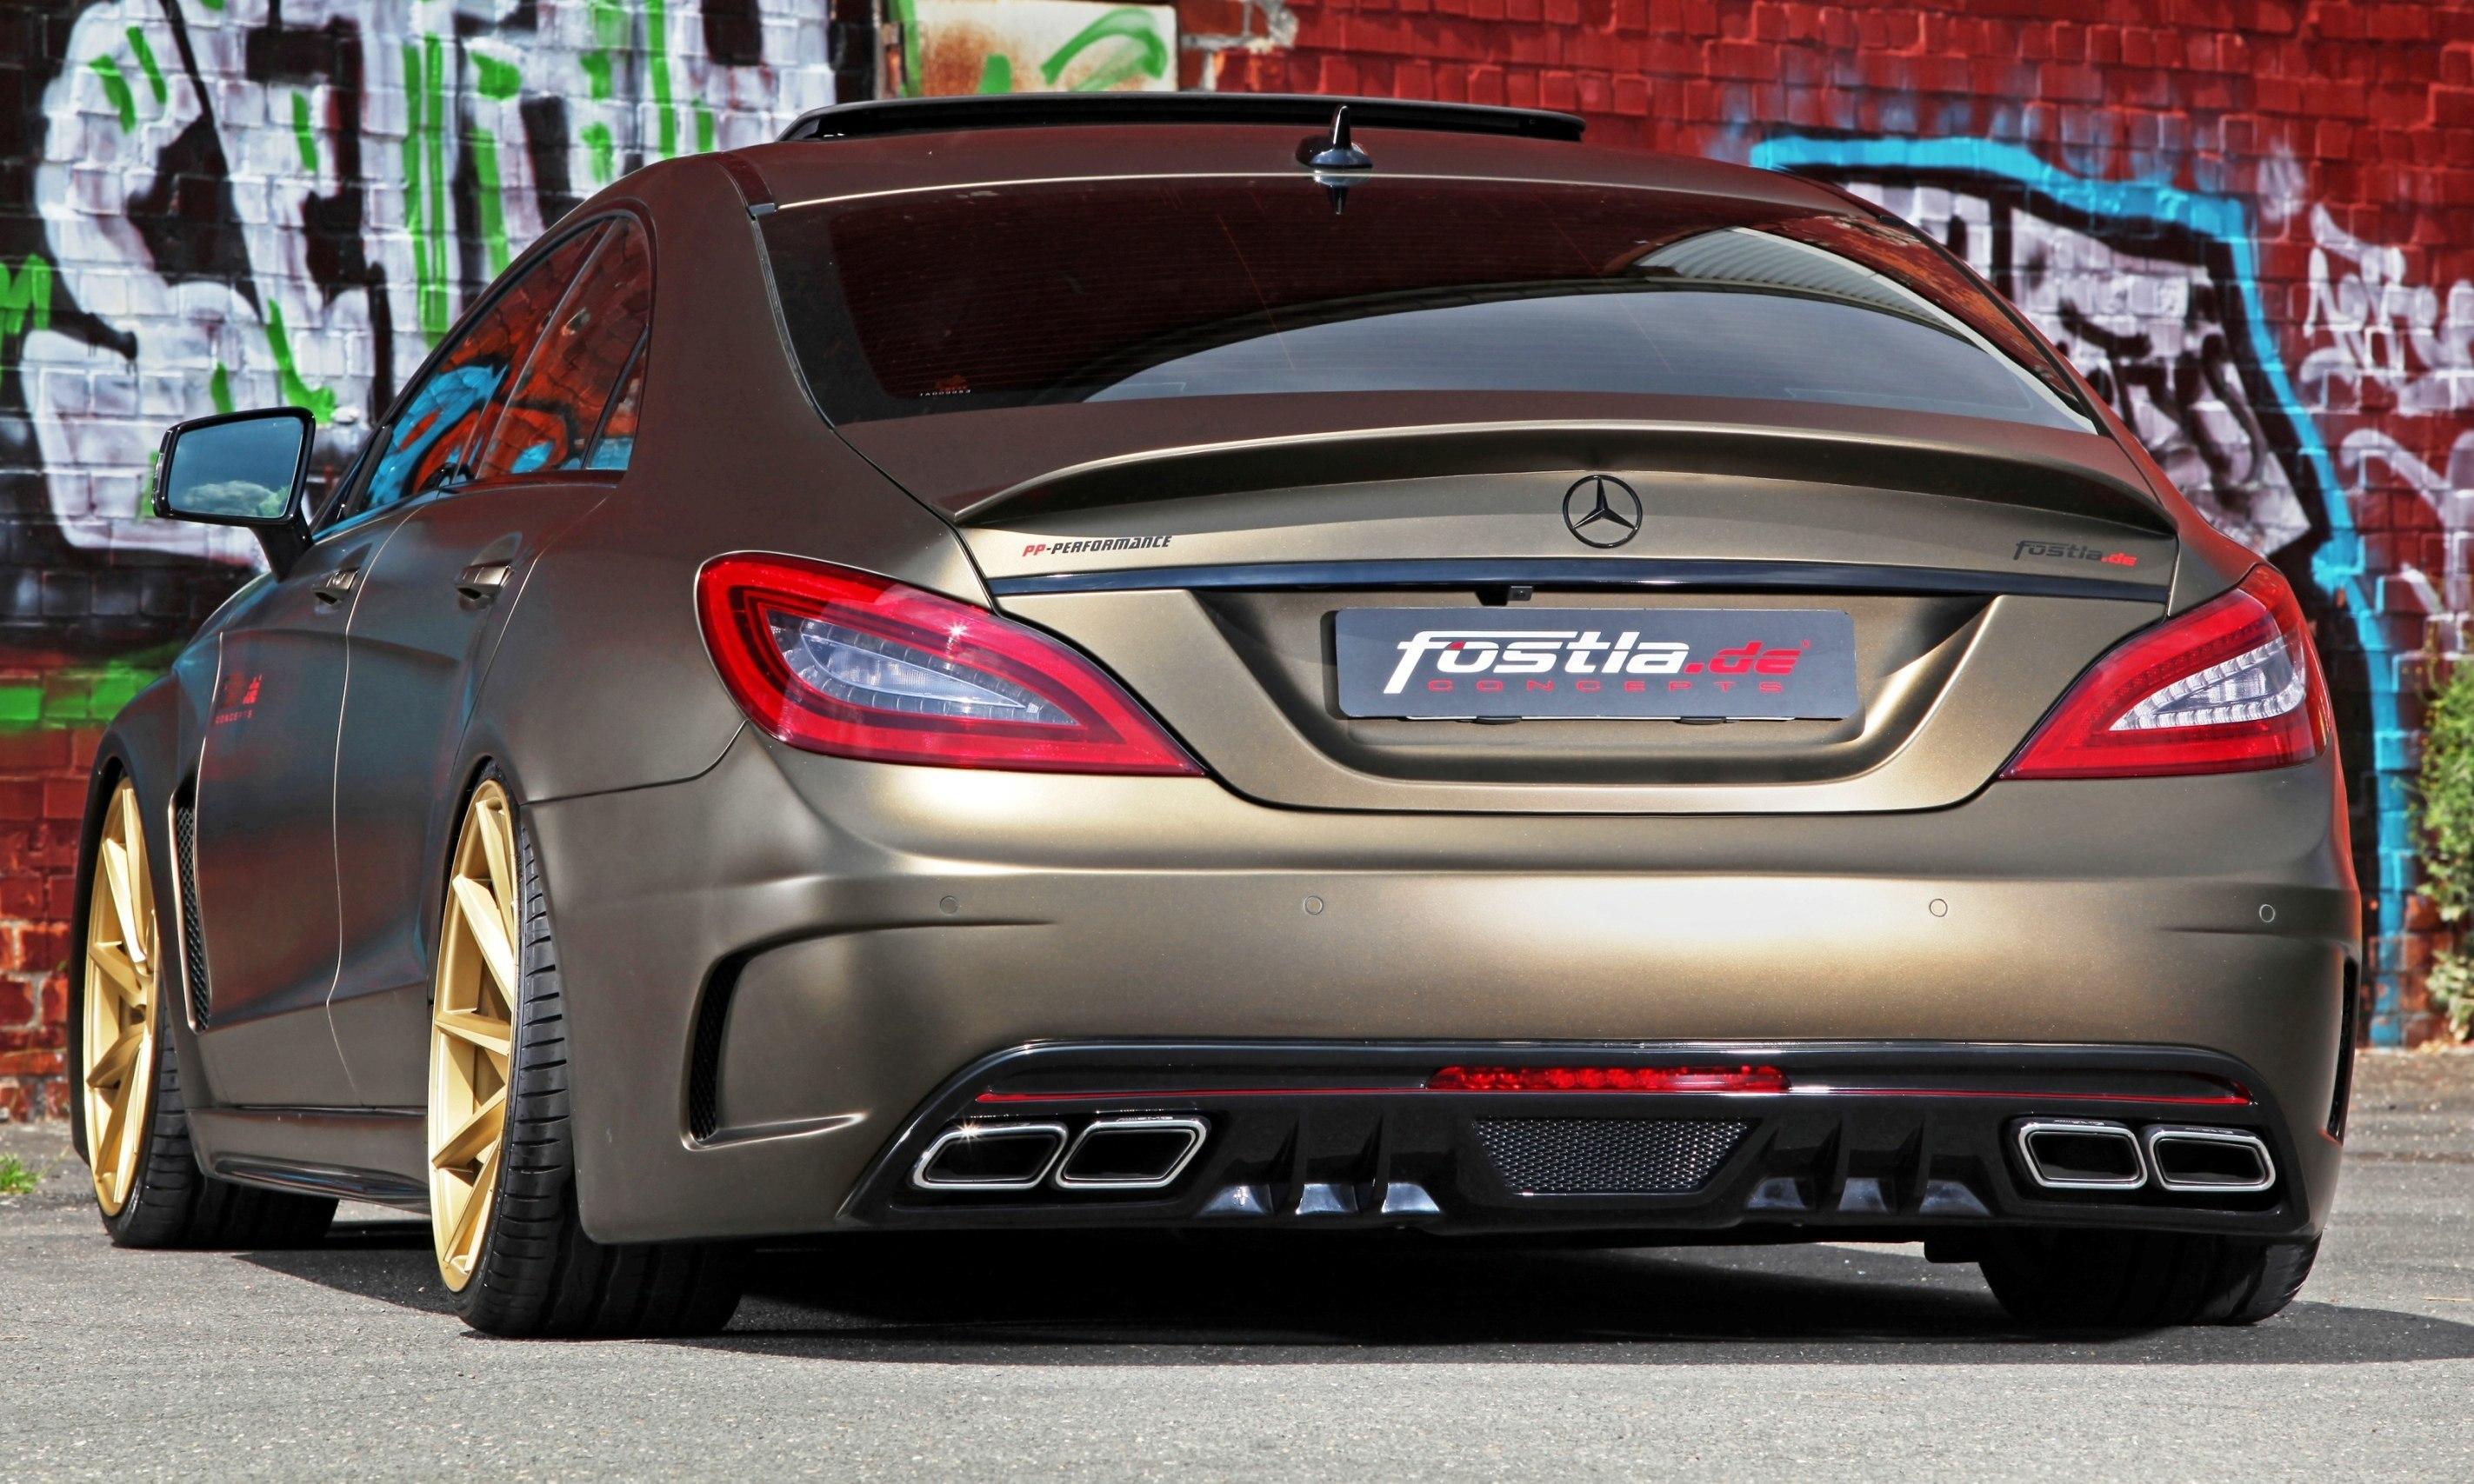 Colour car metallic -  Fostla De Foliation Designs A Wild Mercedes Benz Cls In Metallic Gold Matte 17